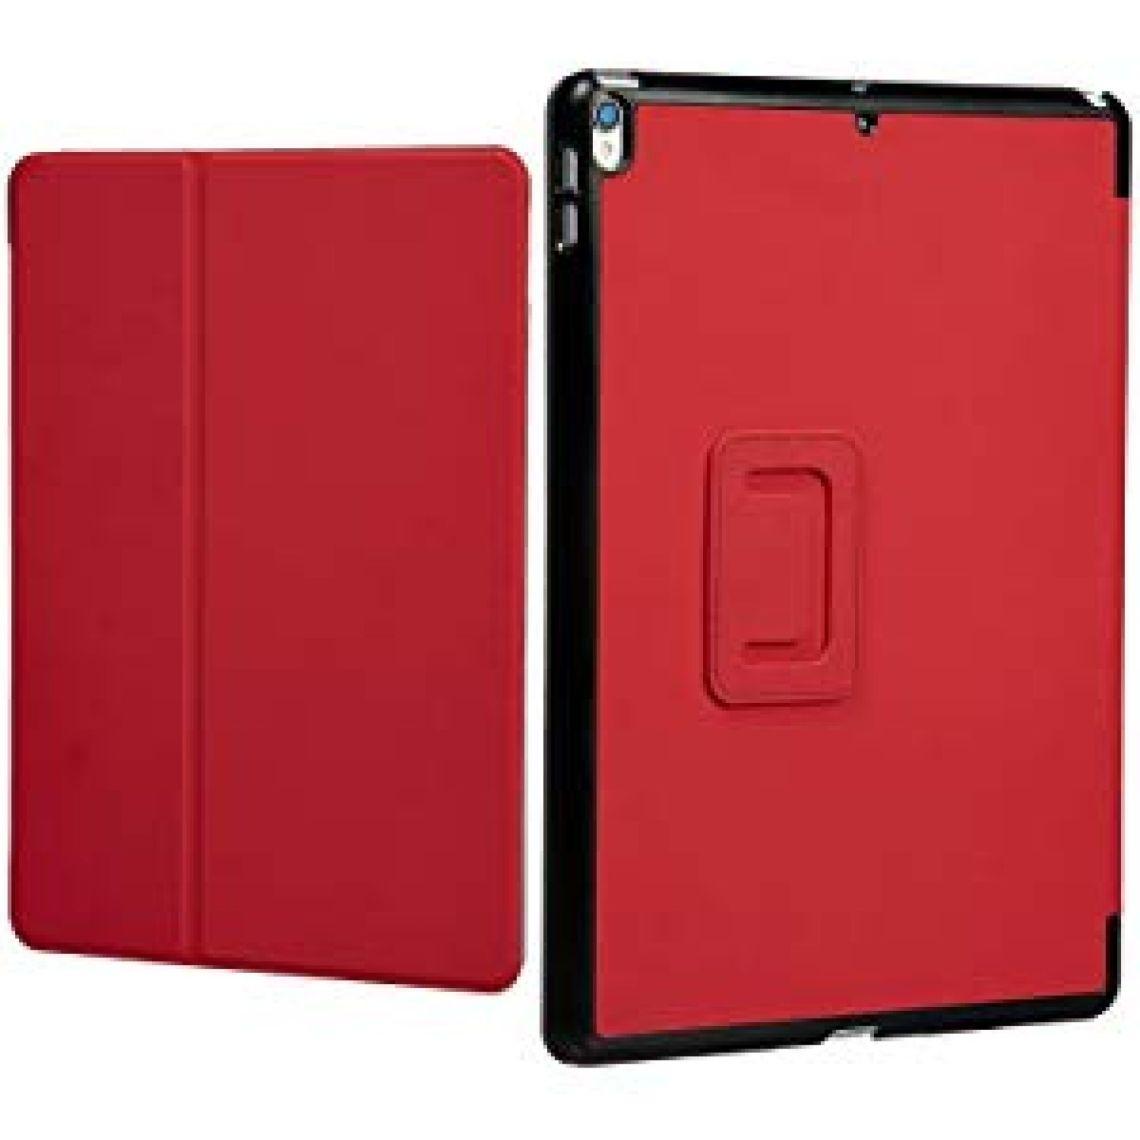 "Amazon.com: AmazonBasics New iPad Pro 2017 Smart Case Auto Wake/Sleep Cover, Red, 10.5"": Computers & Accessories"